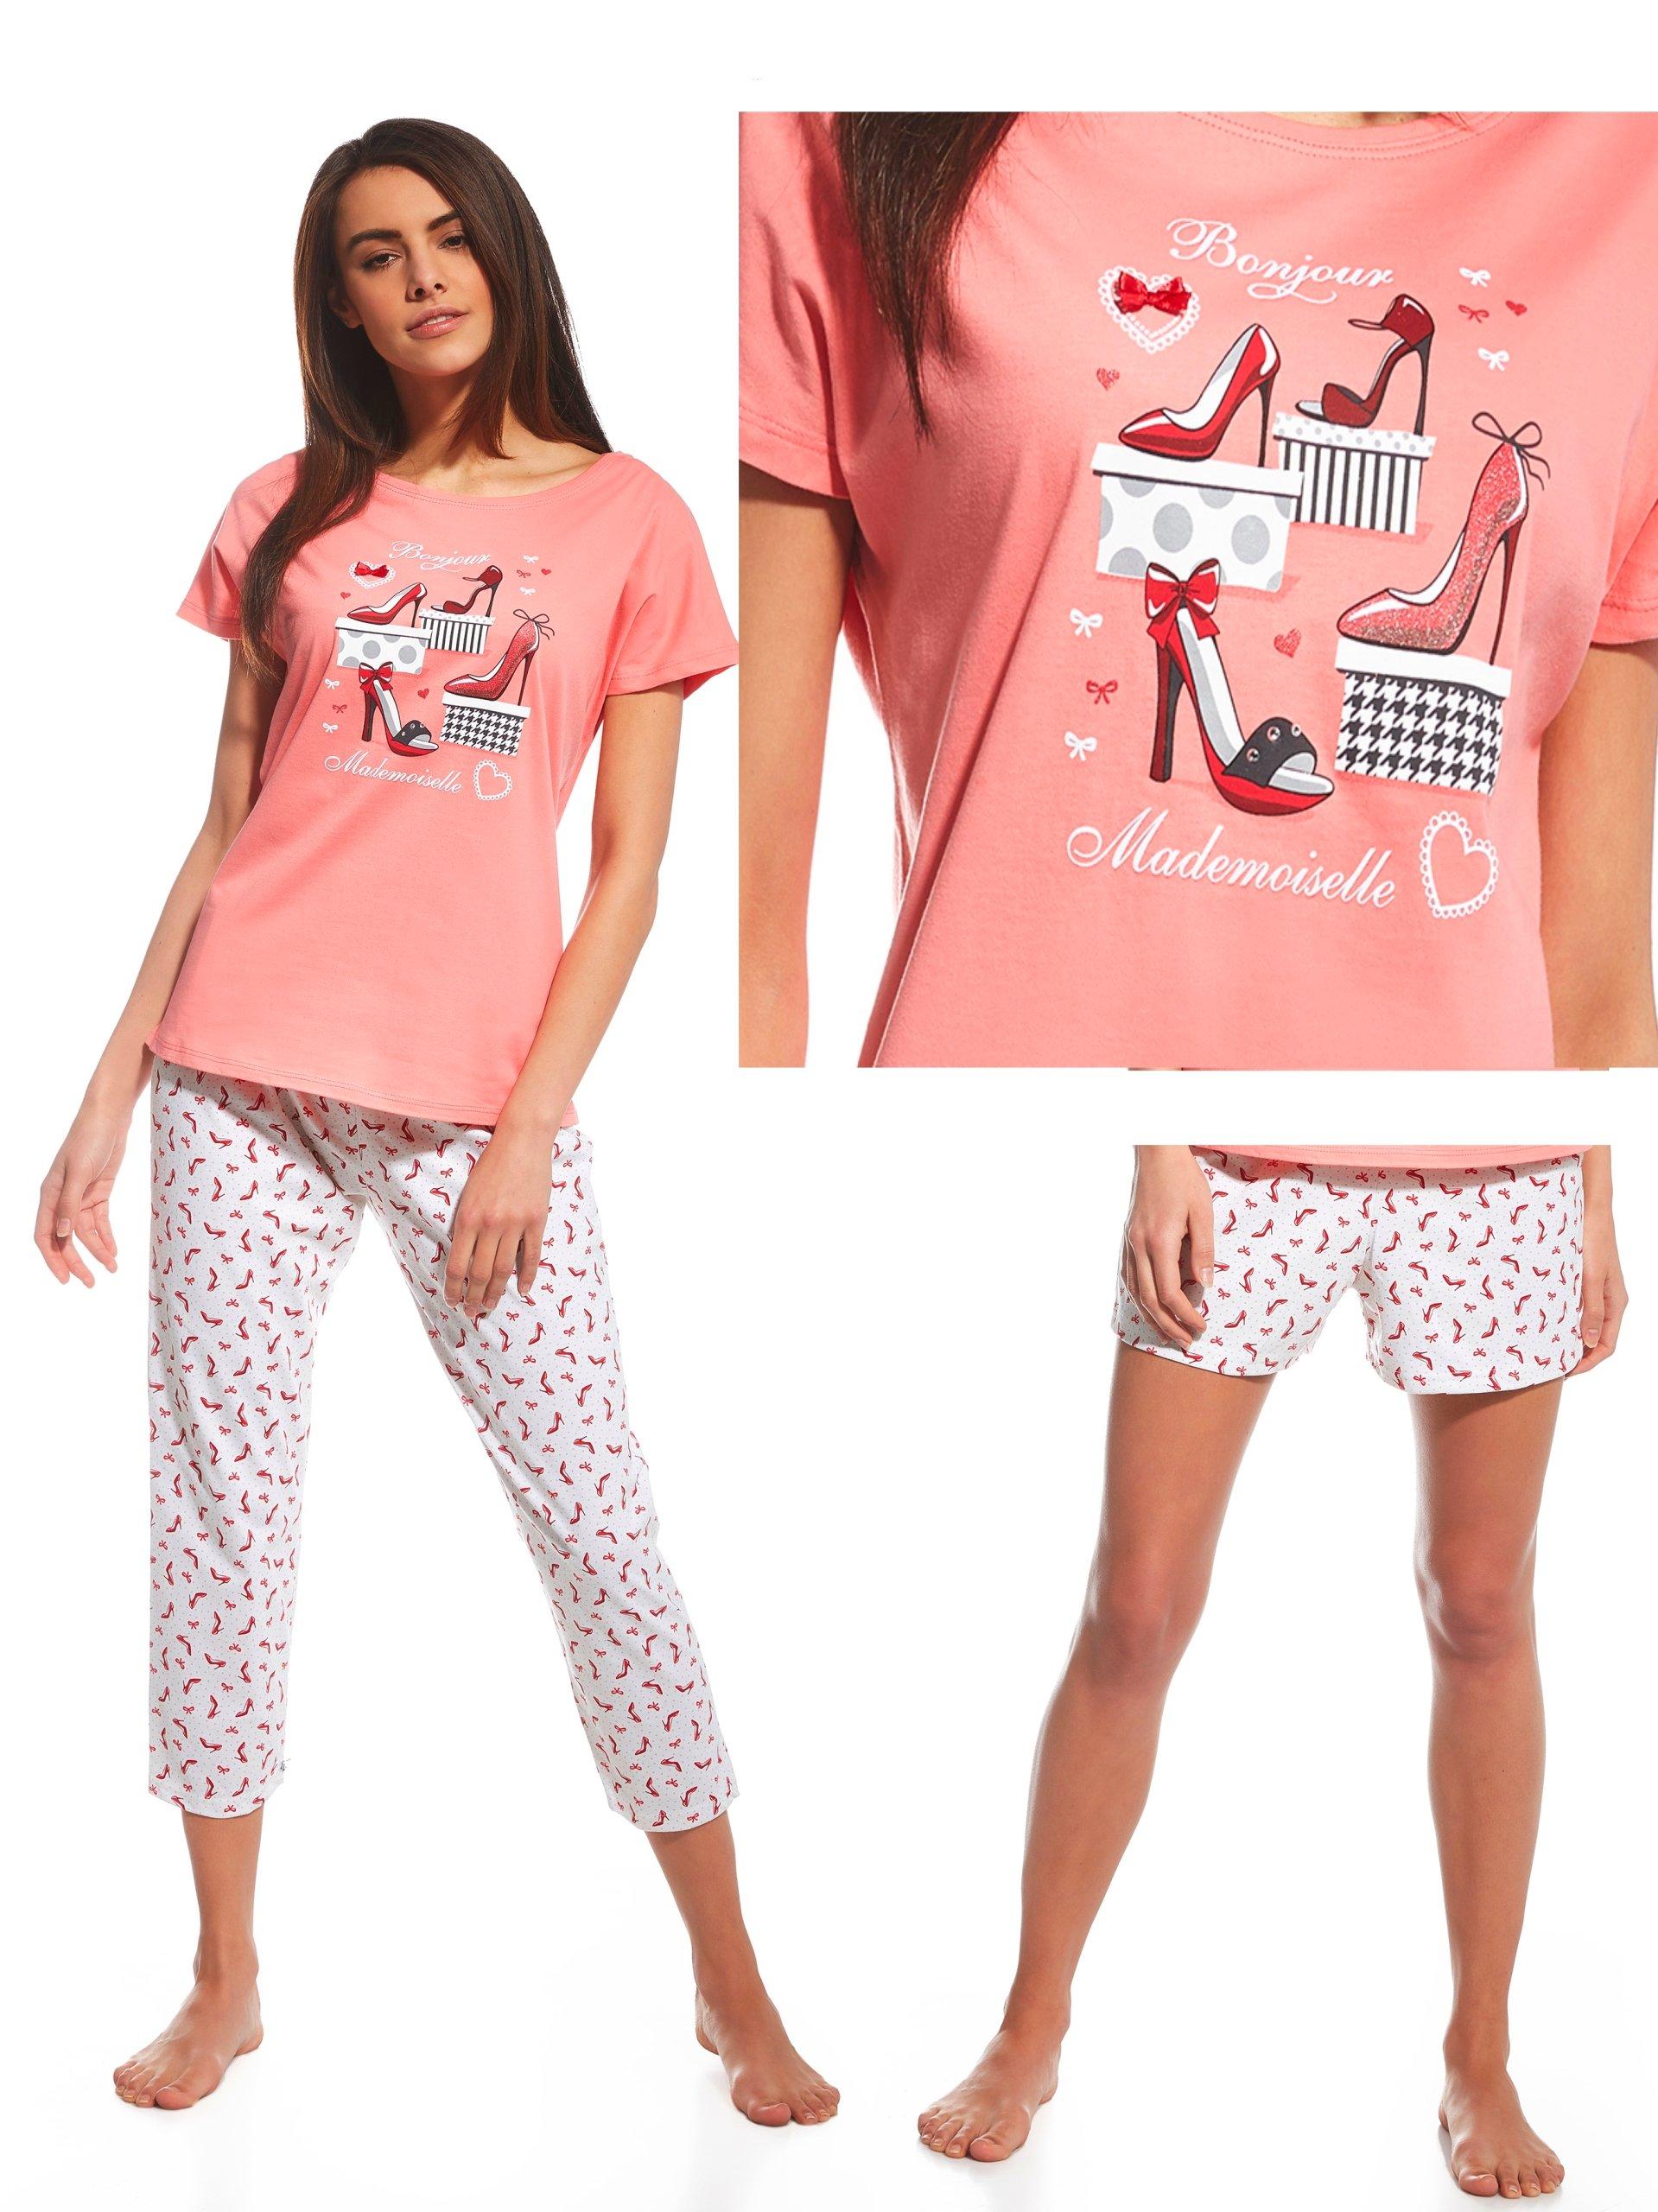 313b8403f03e7d Cornette piżama damska RED SHOES (665/98) XL 42 3c - 6740747503 ...